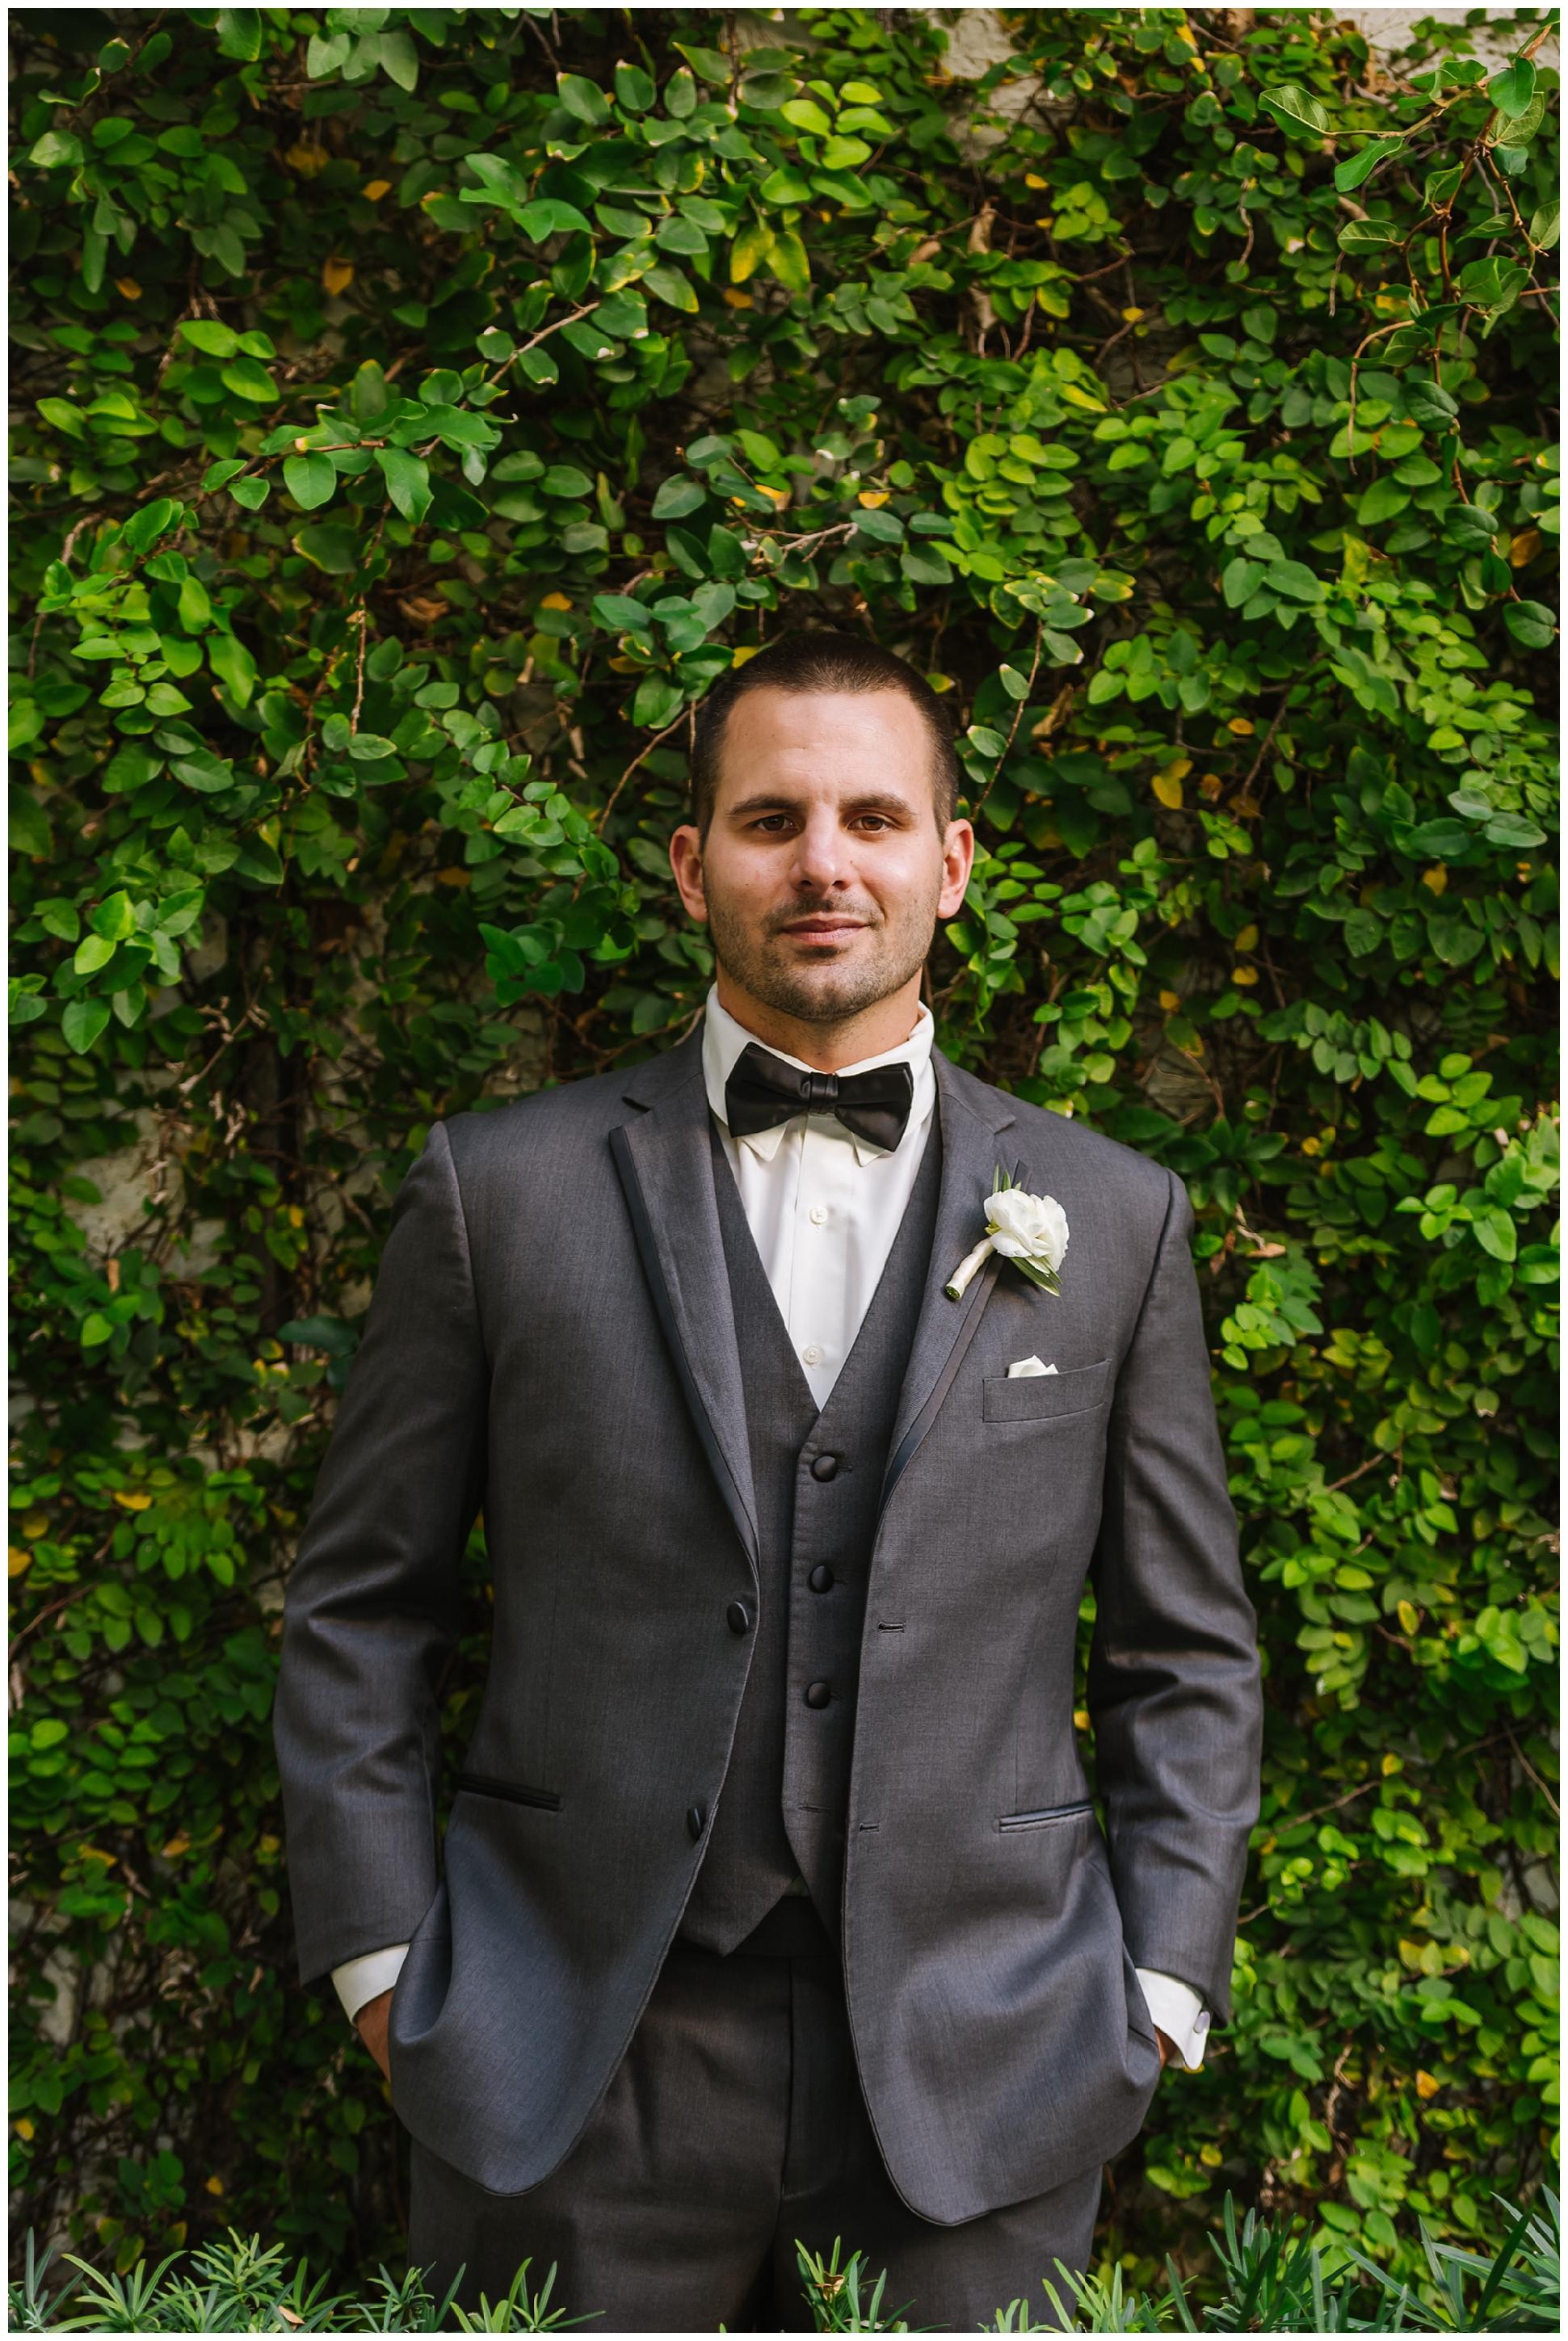 Sarasota-wedding-photographer-hyatt-regency-blush_0026.jpg